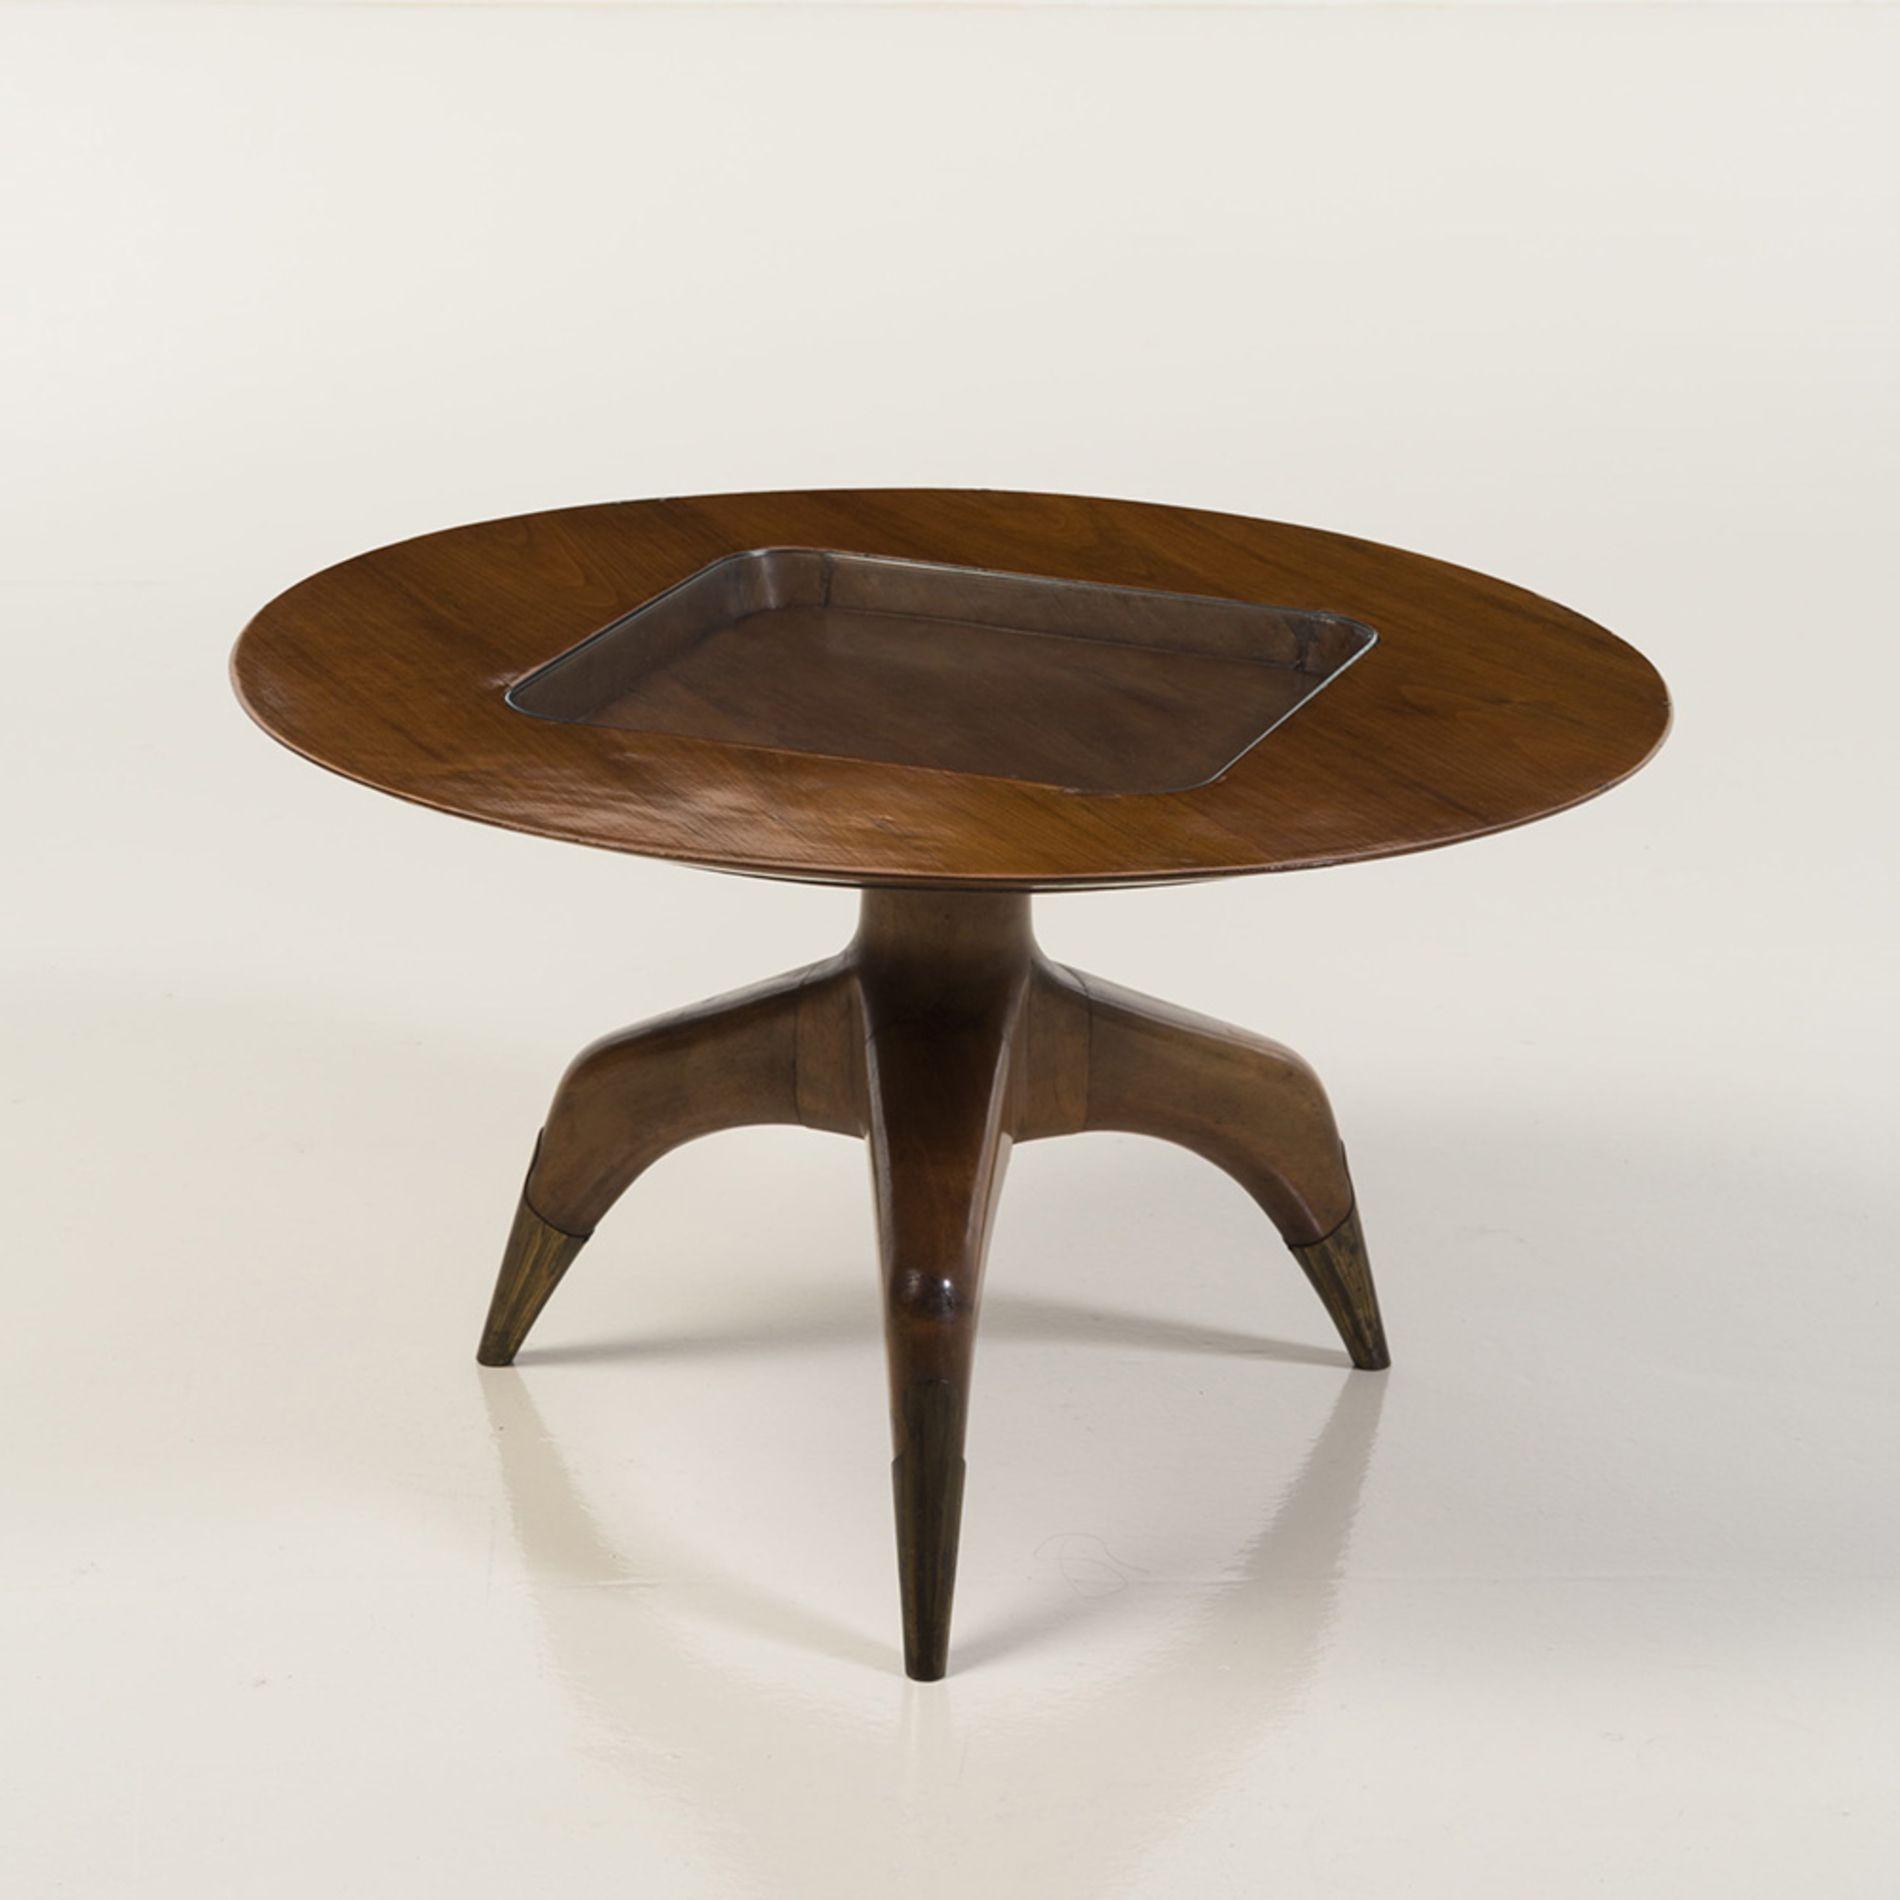 1940s Gio Ponti Table Basse Noyer Et Laiton Date De Creation